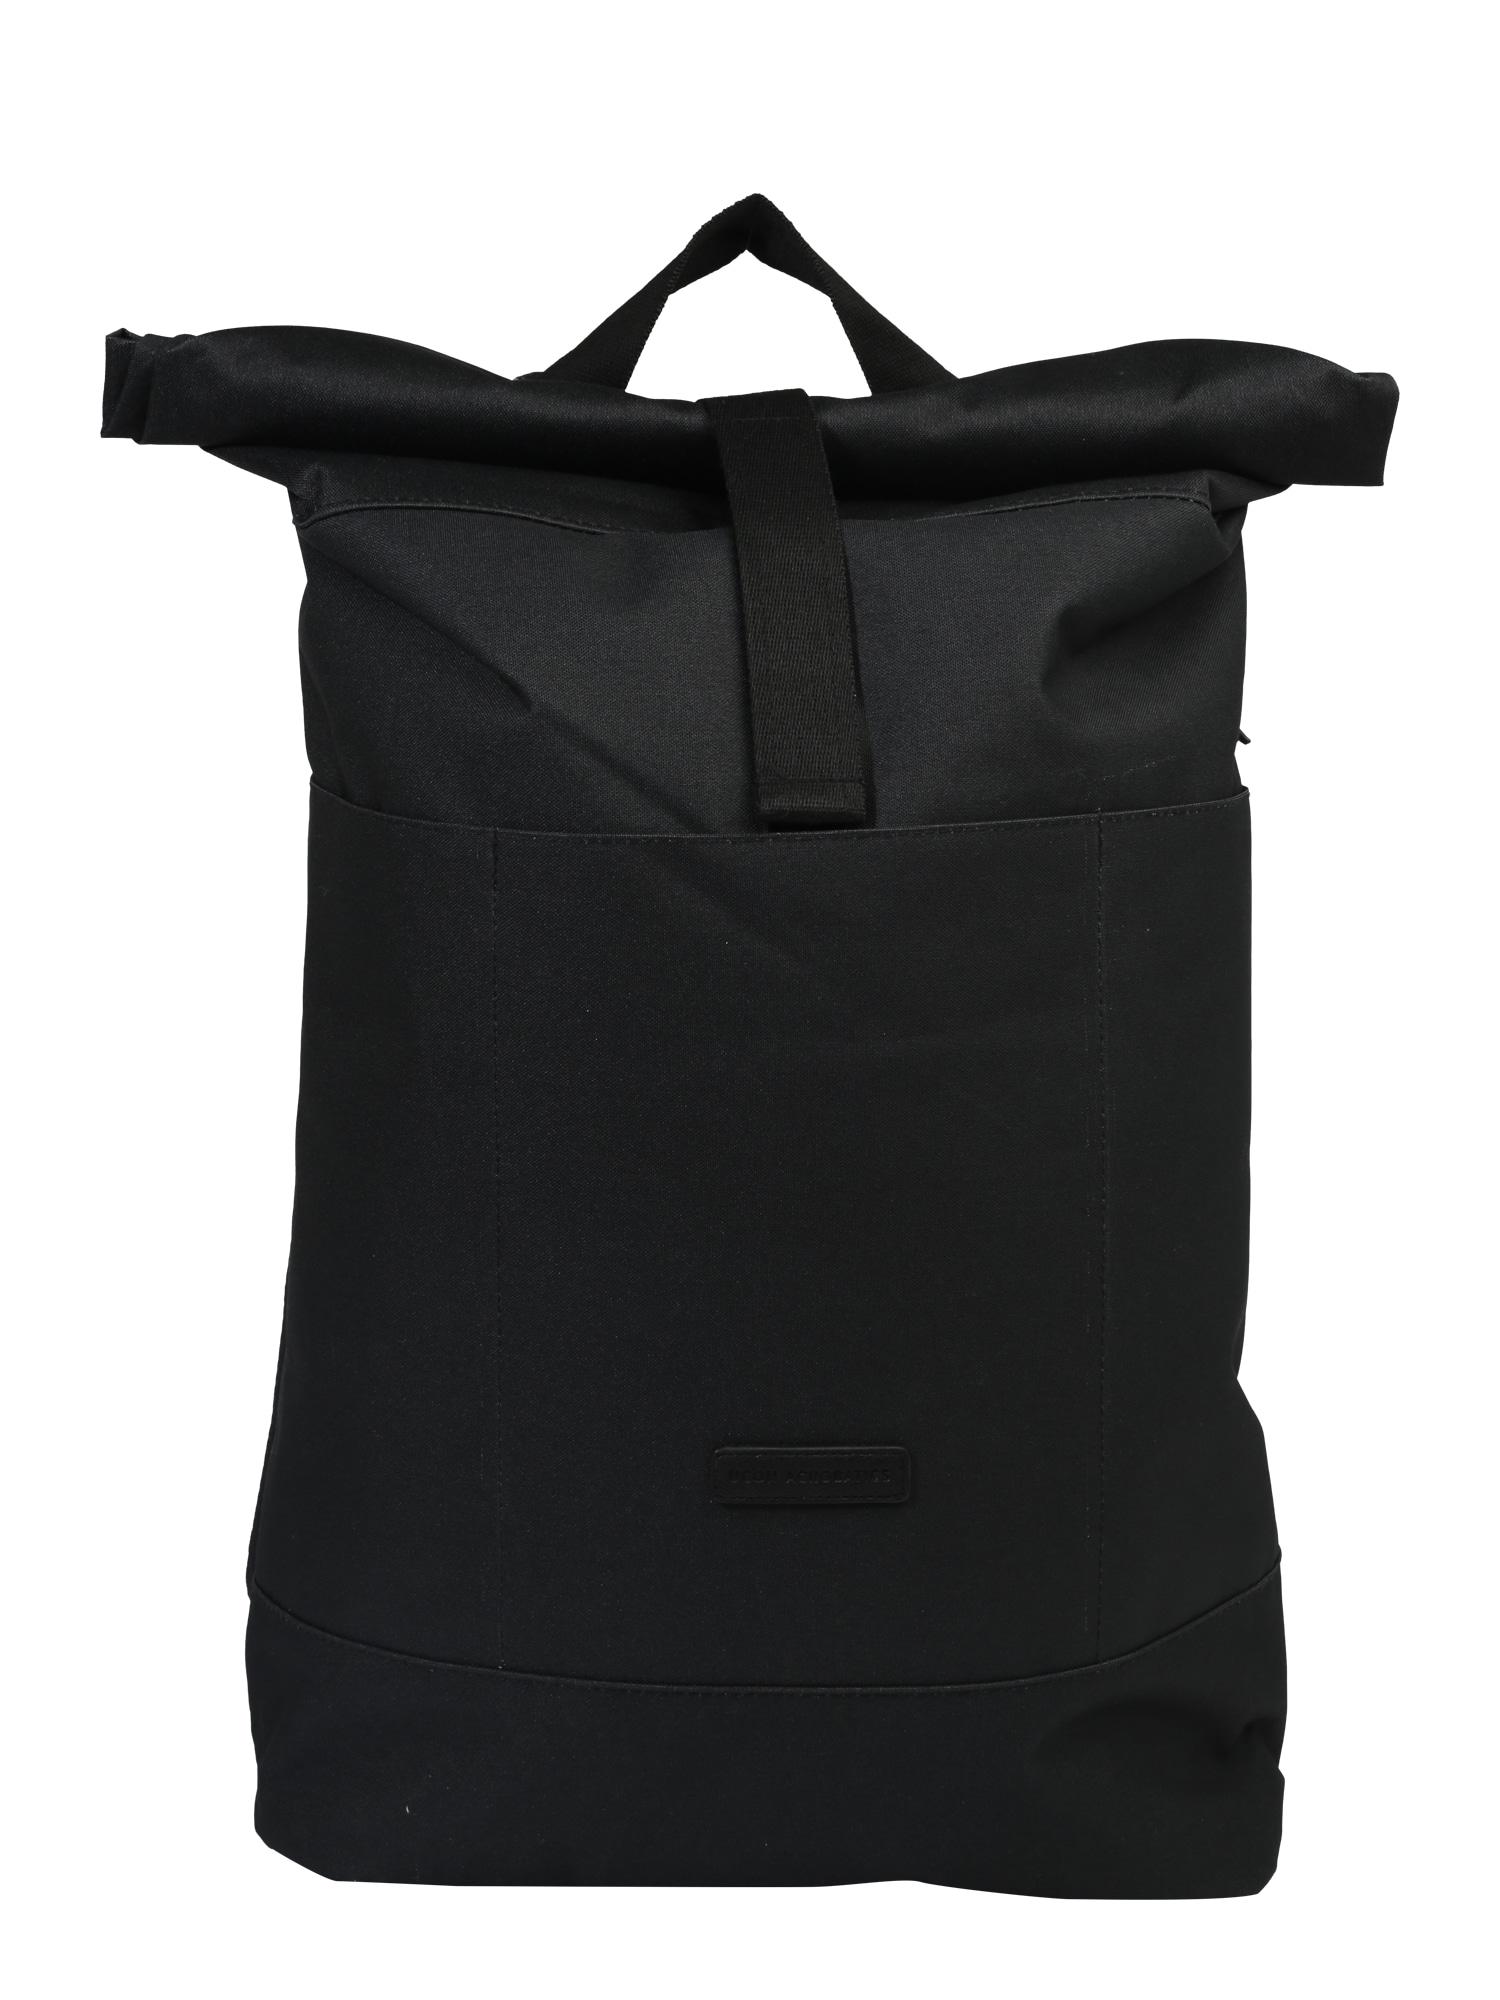 Batoh Hajo Backpack černá Ucon Acrobatics